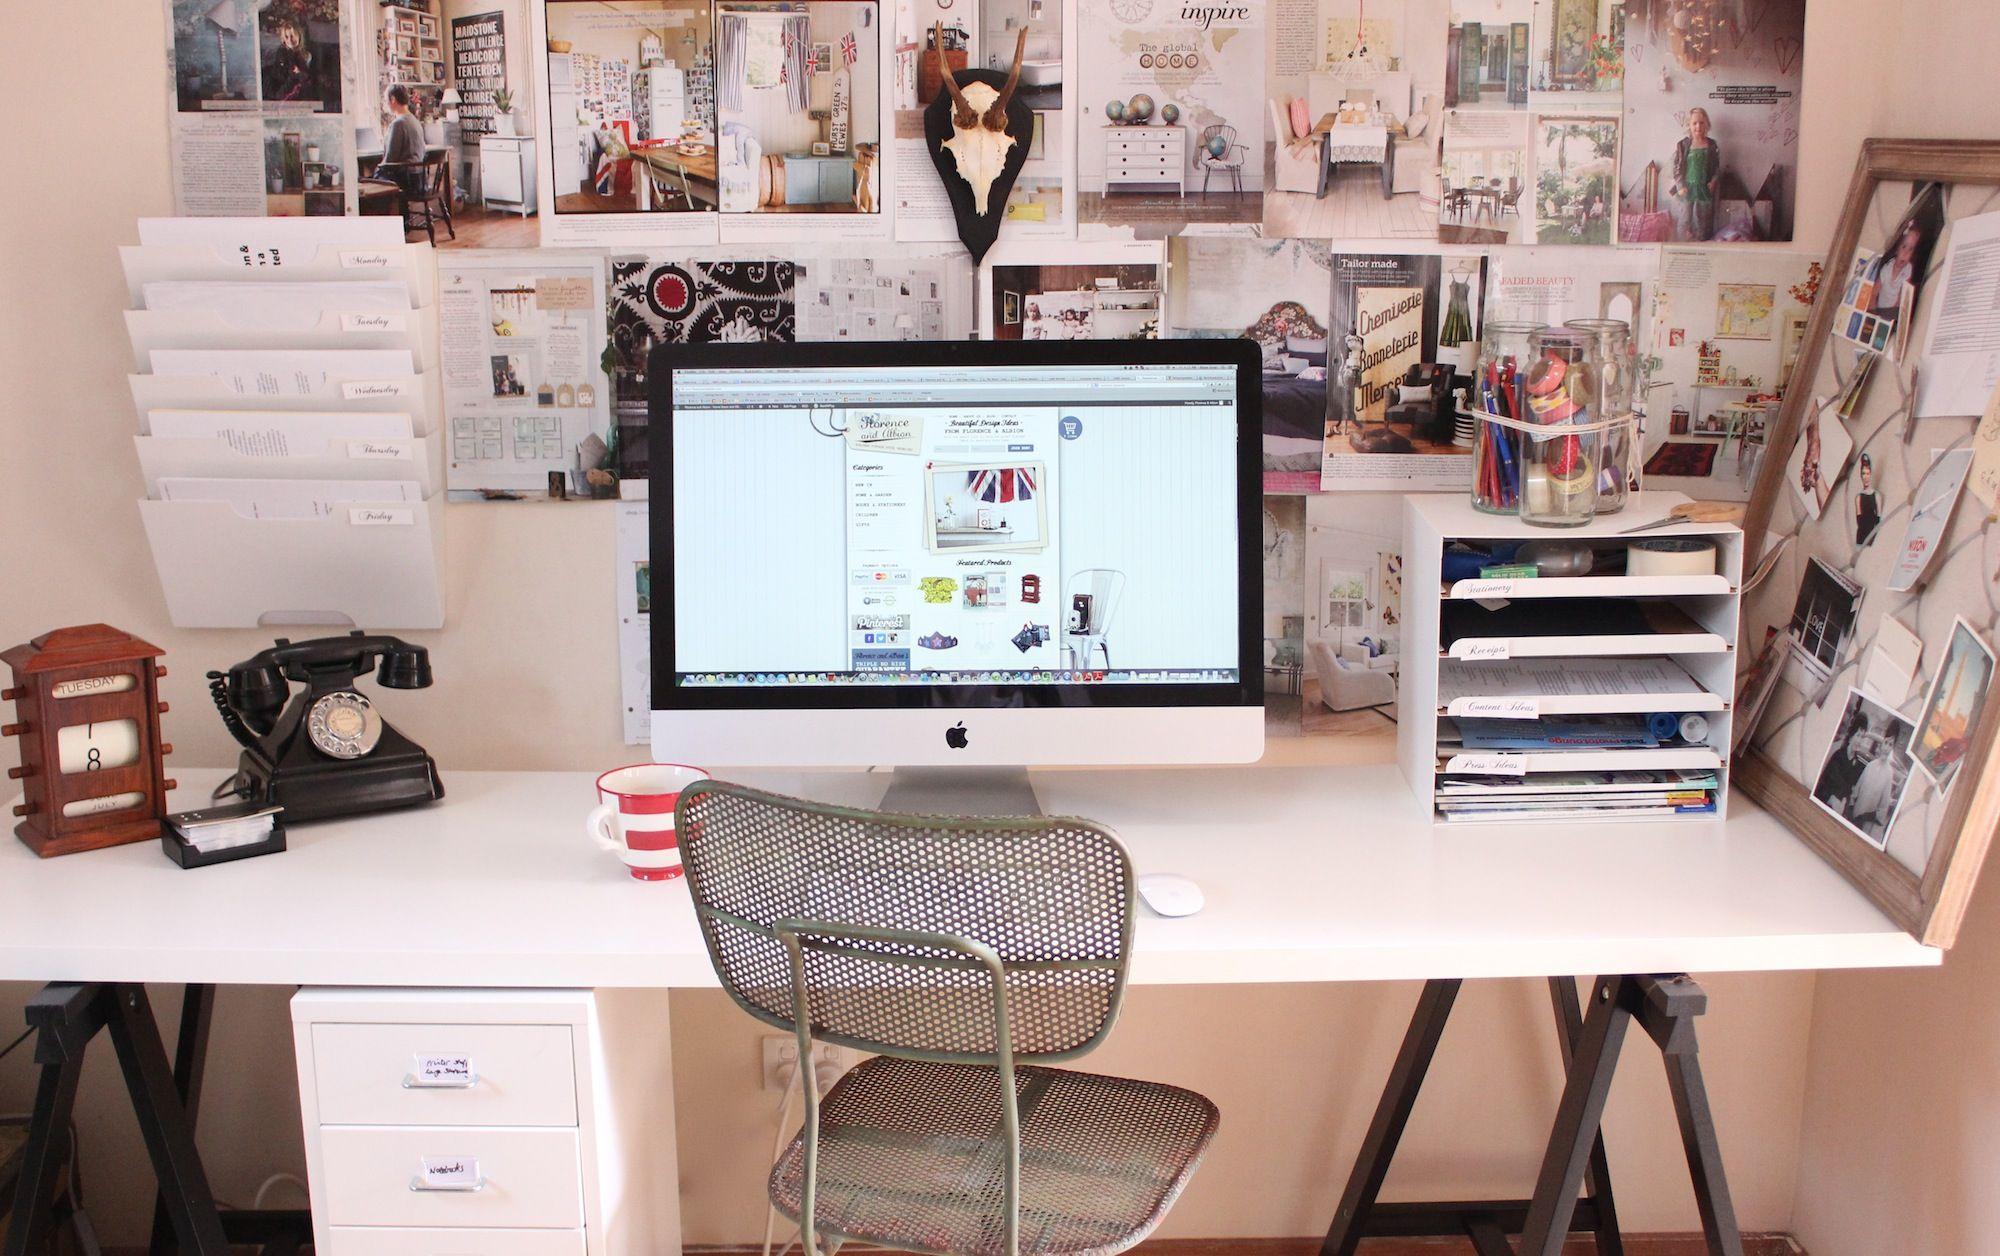 Cool Desk Organizer Ideas Design Decorating 811594